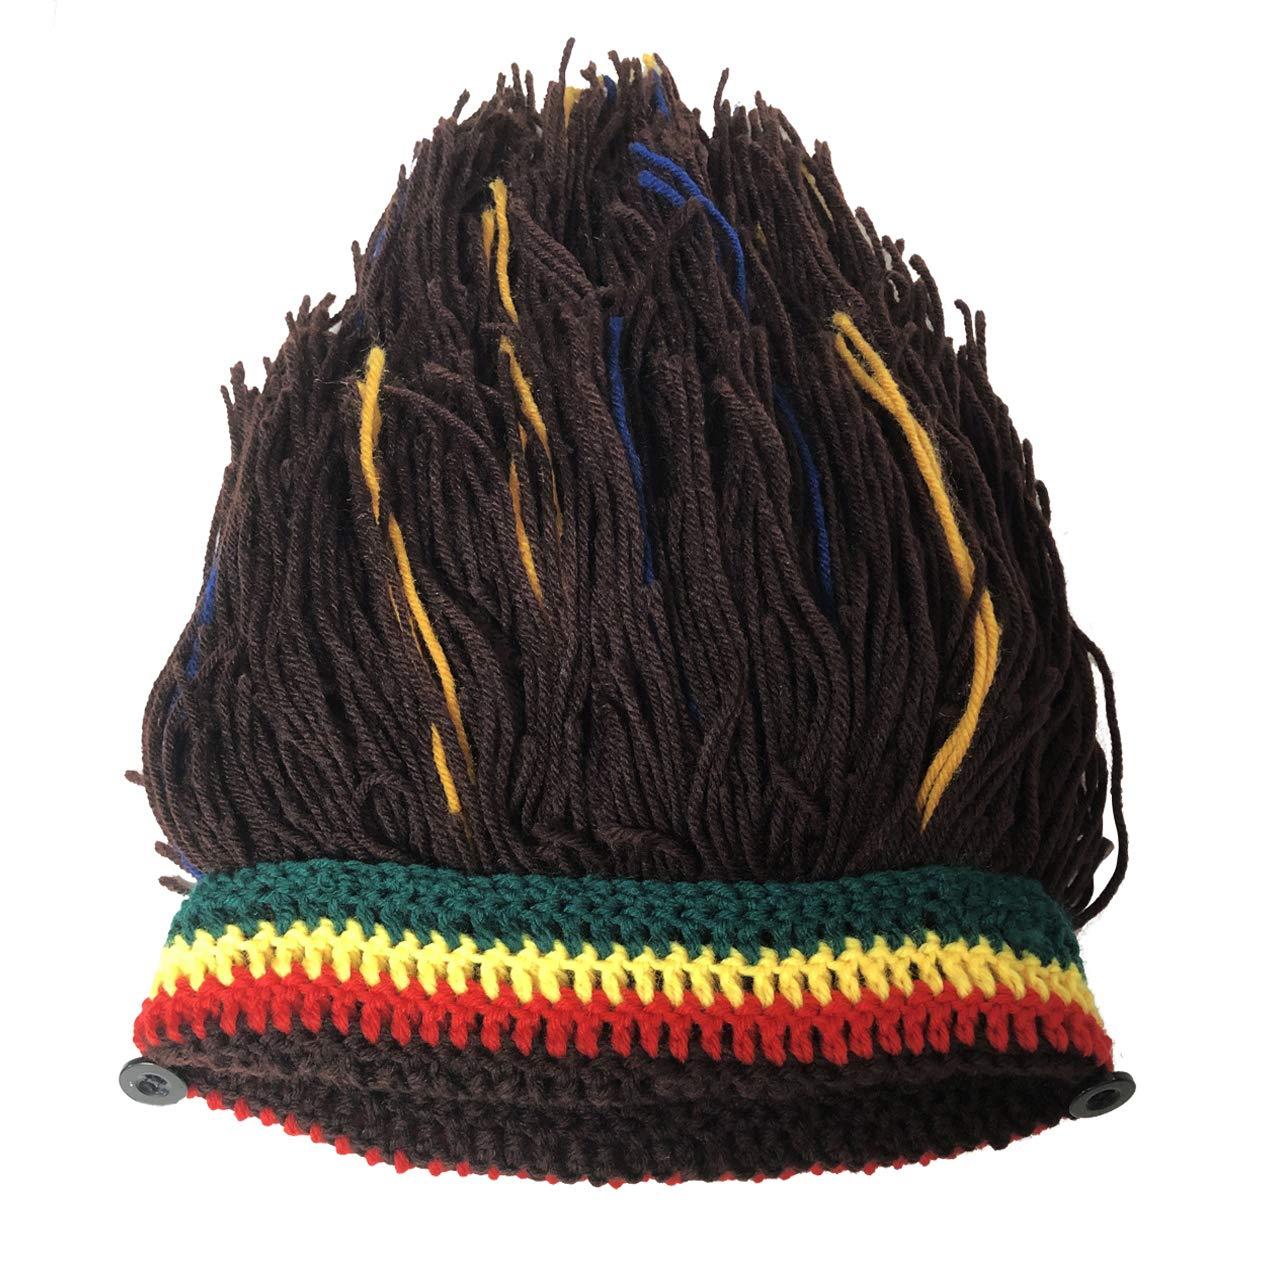 Funny Knit Beanie Beard Hat Rasta Hat with Dreadlocks Handmade Wig